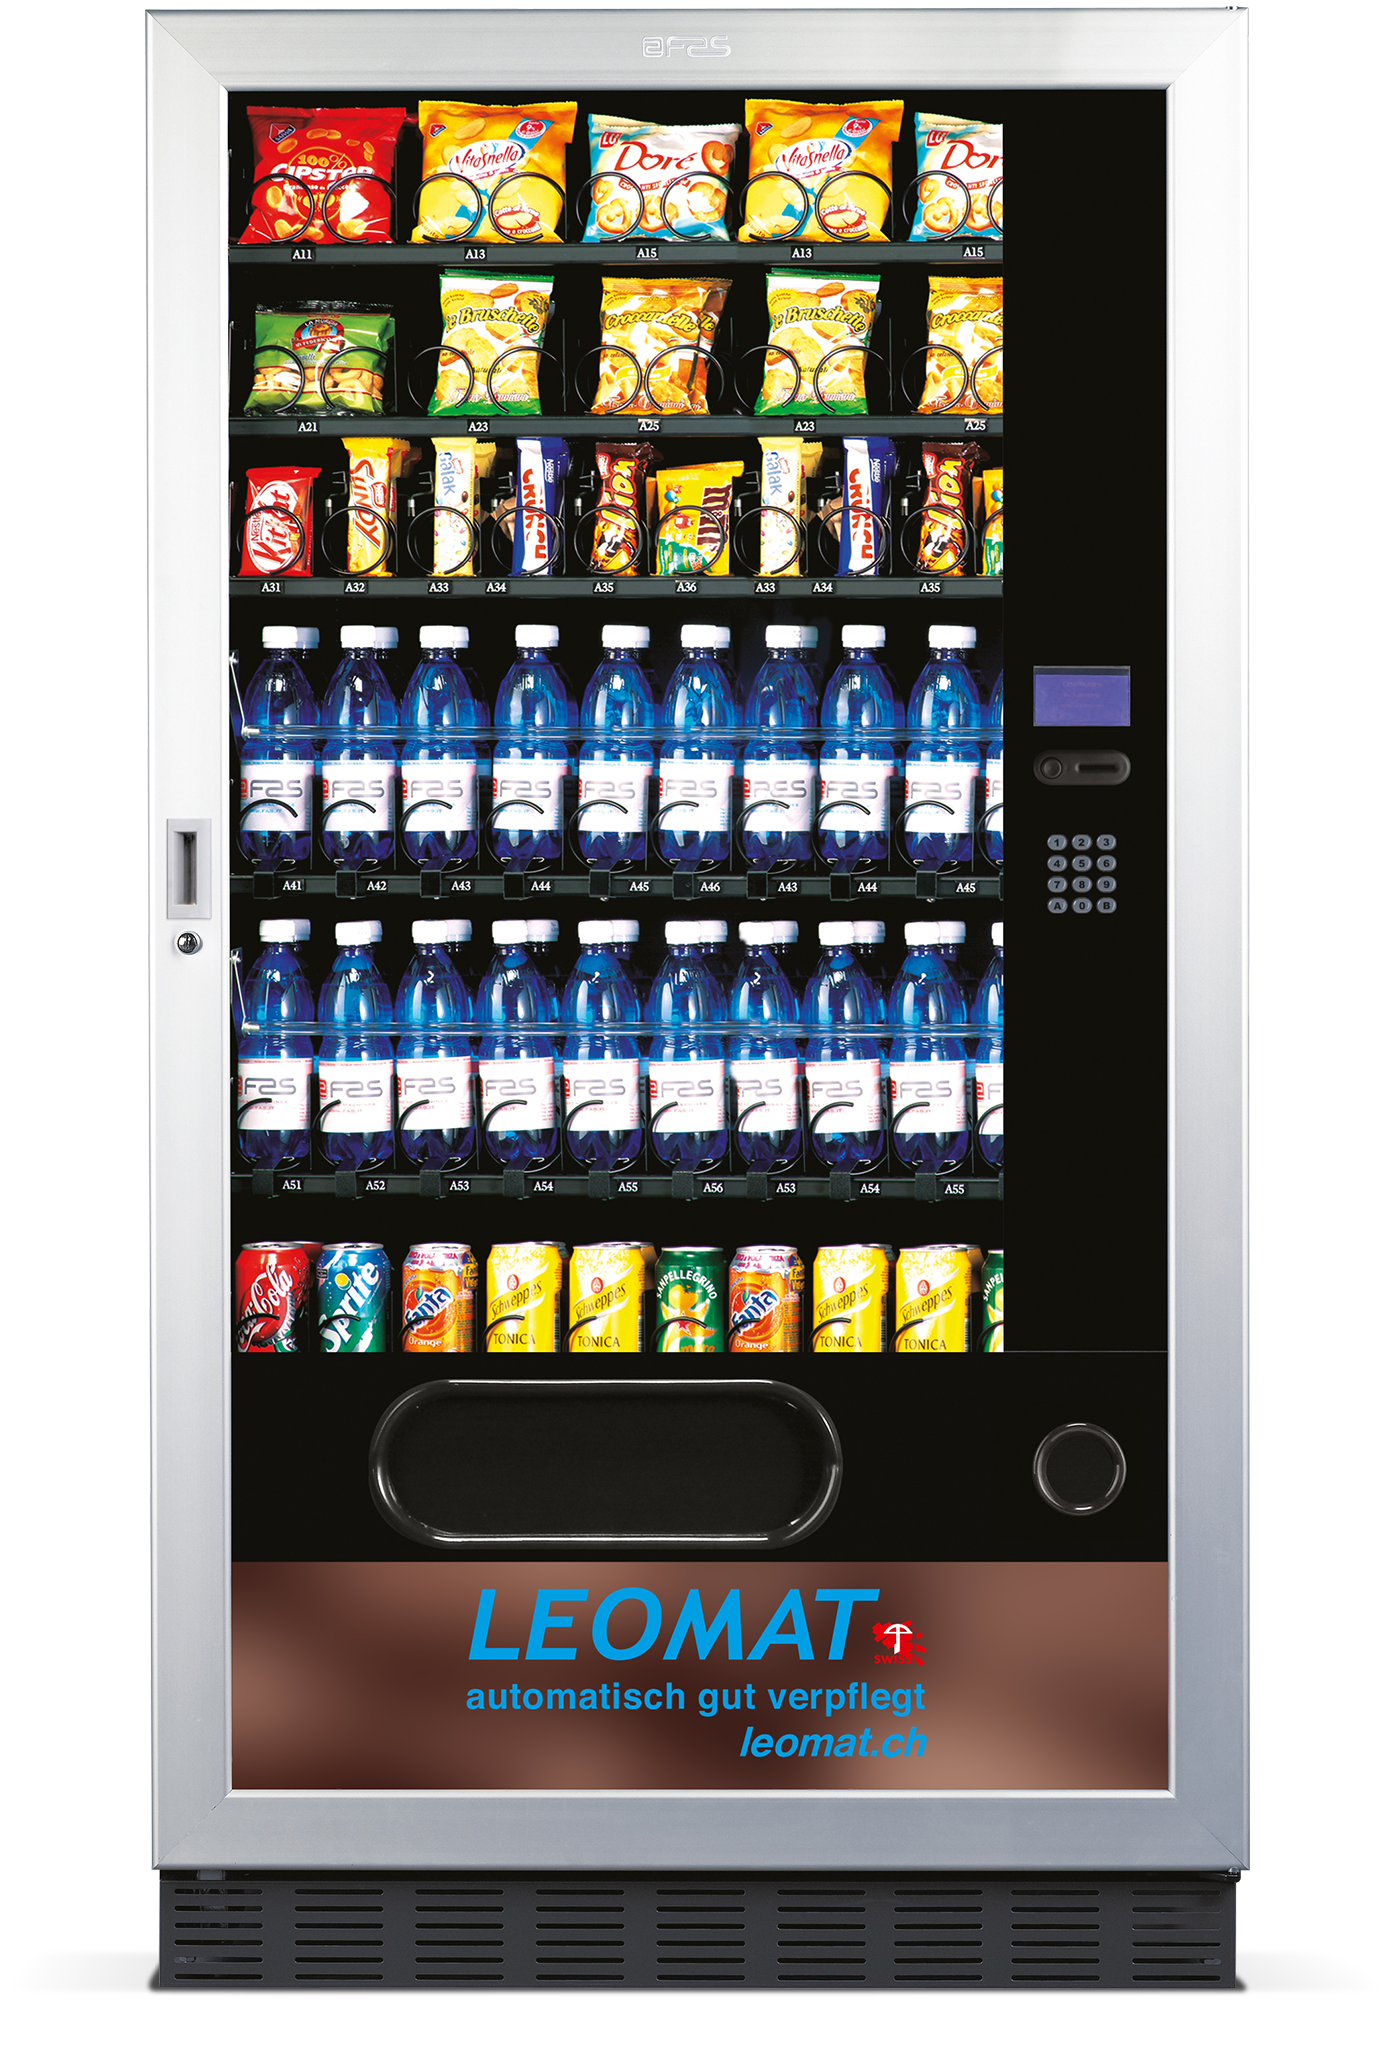 verpflegungsautomat  u0026 snackautomat fast 1050